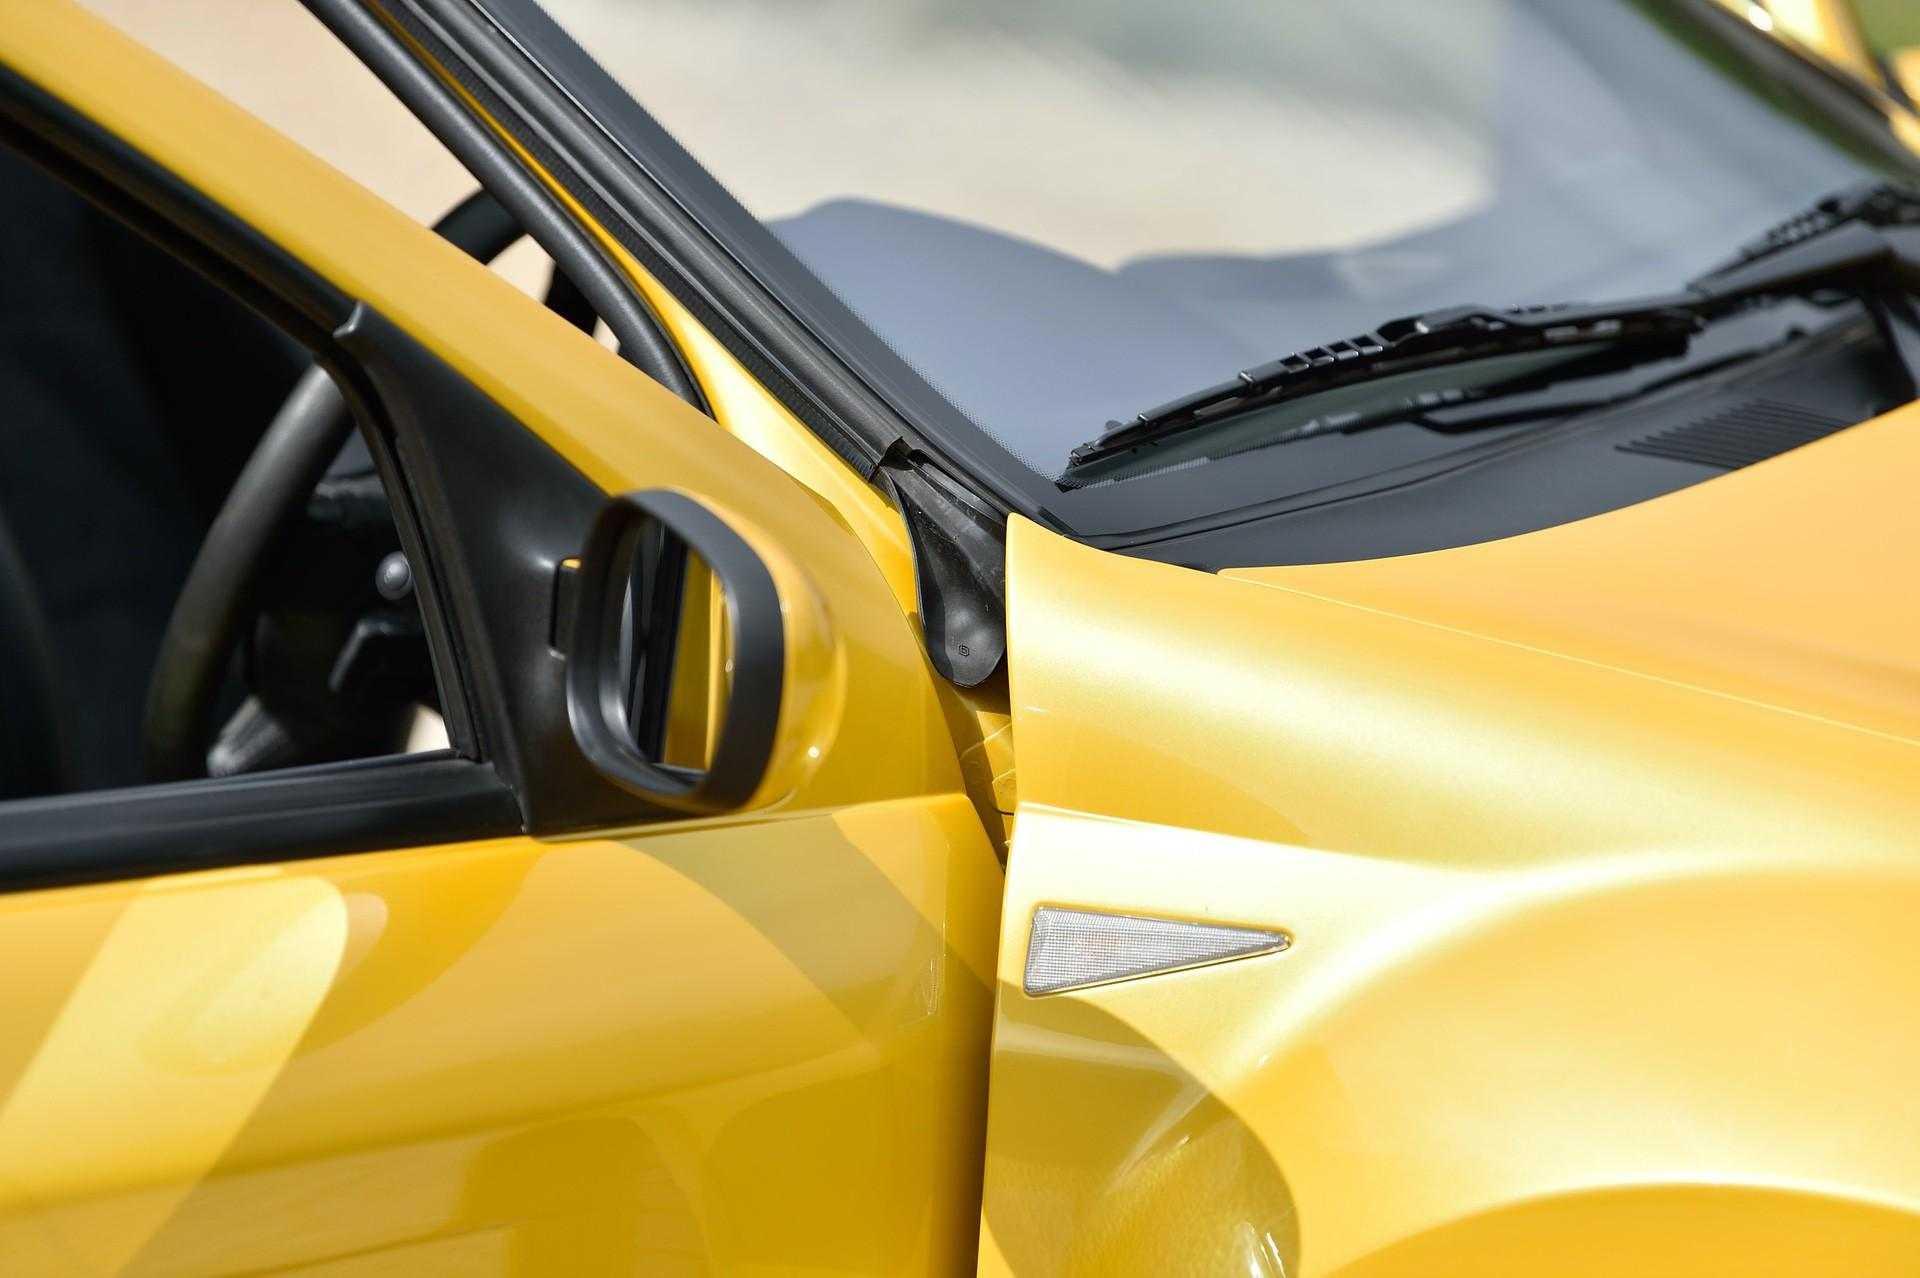 2005_Renault_Clio_V6_Phase_2_0135